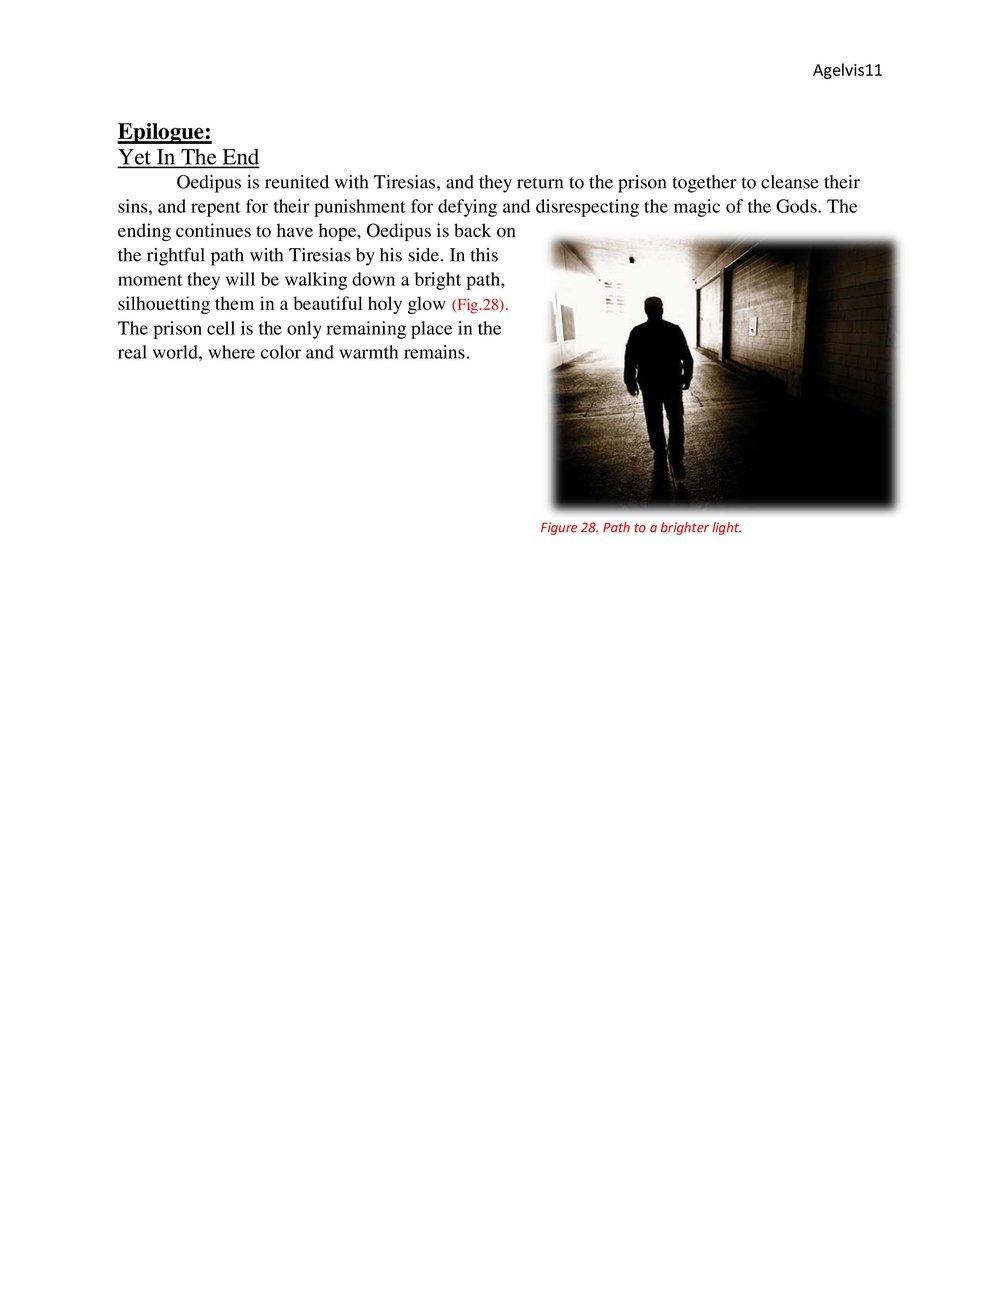 OER-ST-NA-page-011.jpg